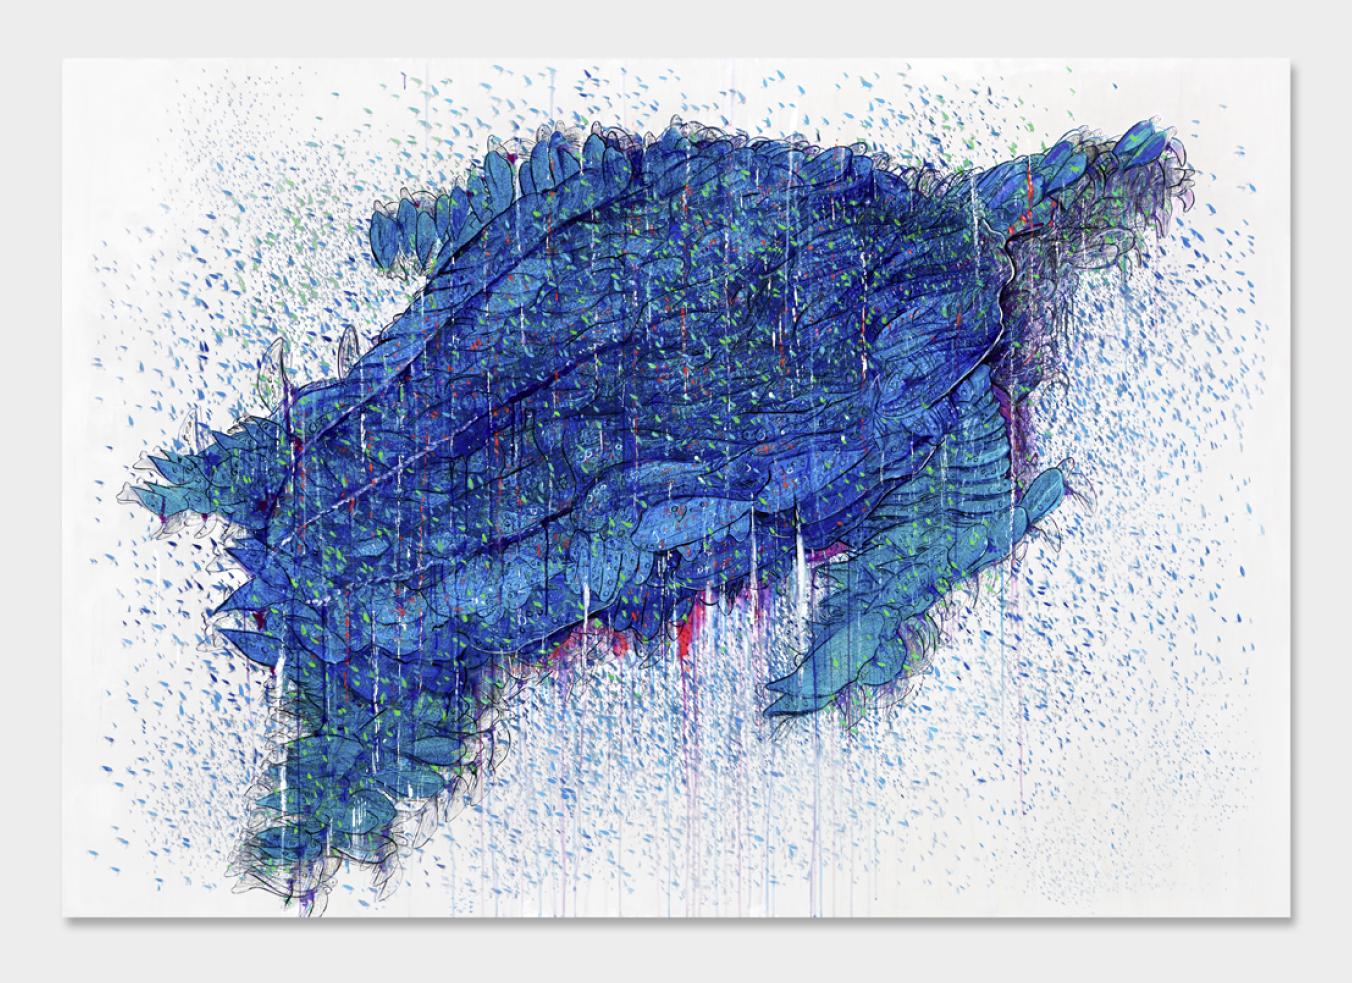 endcount-leatherback-turtle-2